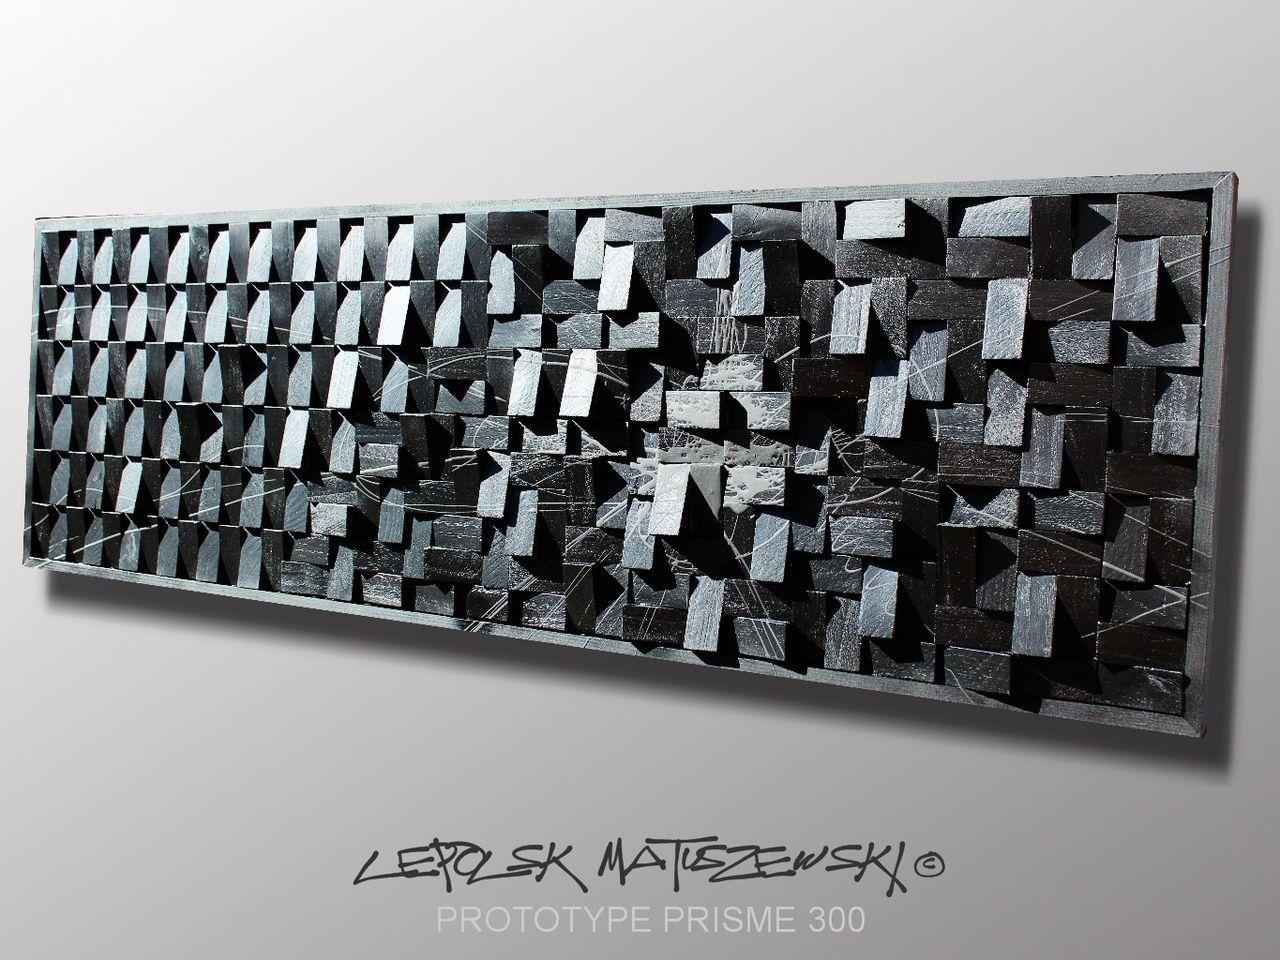 MISTER K  - Lepolsk Matuszewski PROTOTYPE PRISME 300   Expressionnisme abstrait contemporain